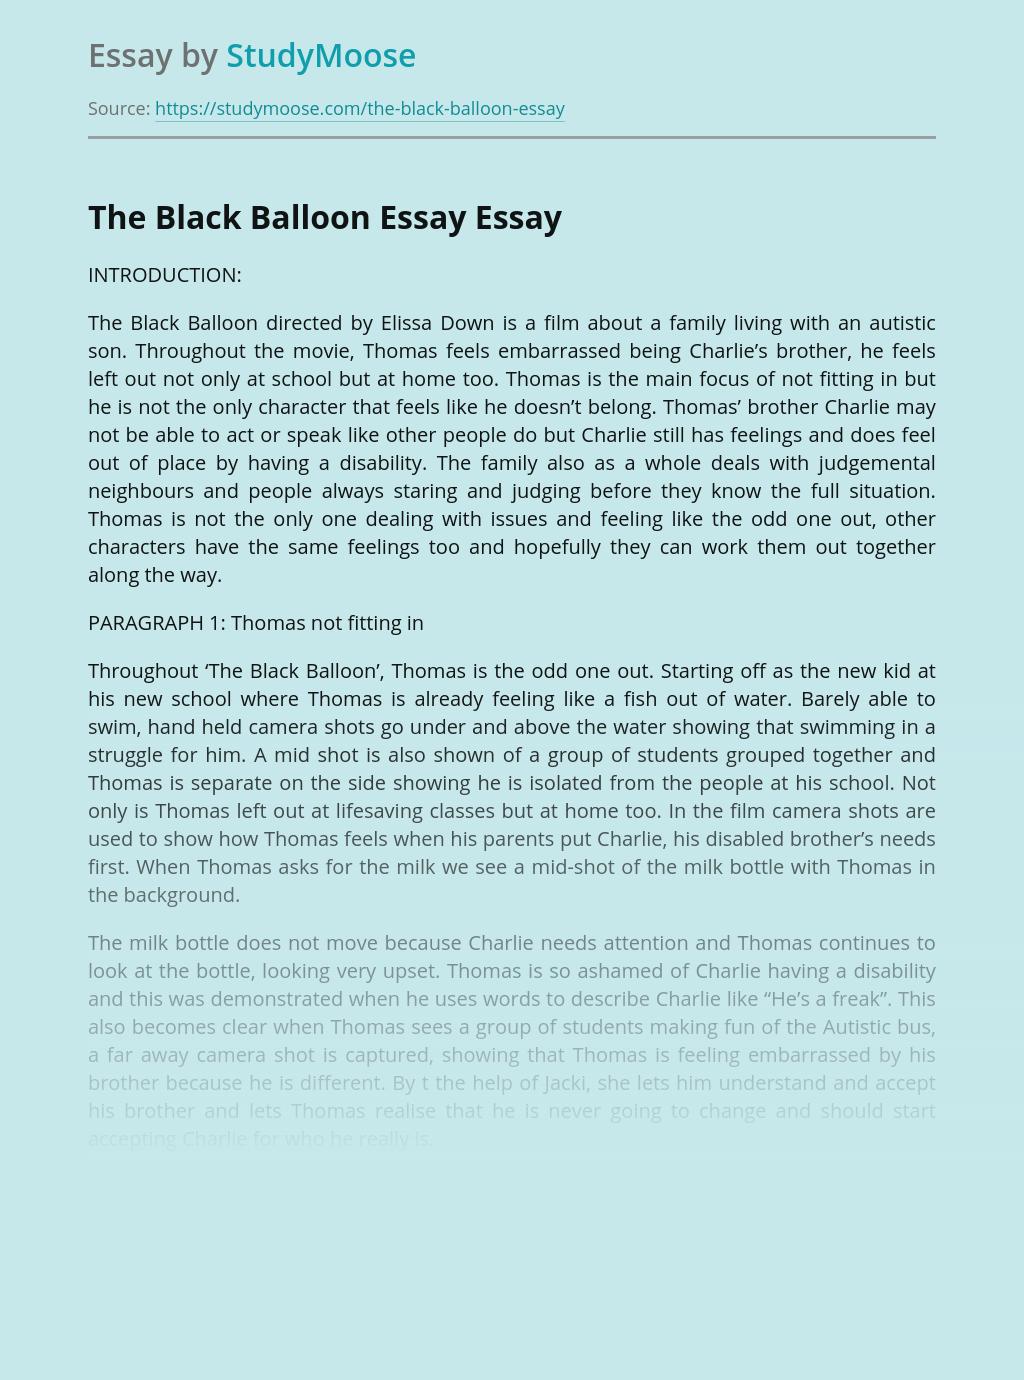 The Black Balloon Essay